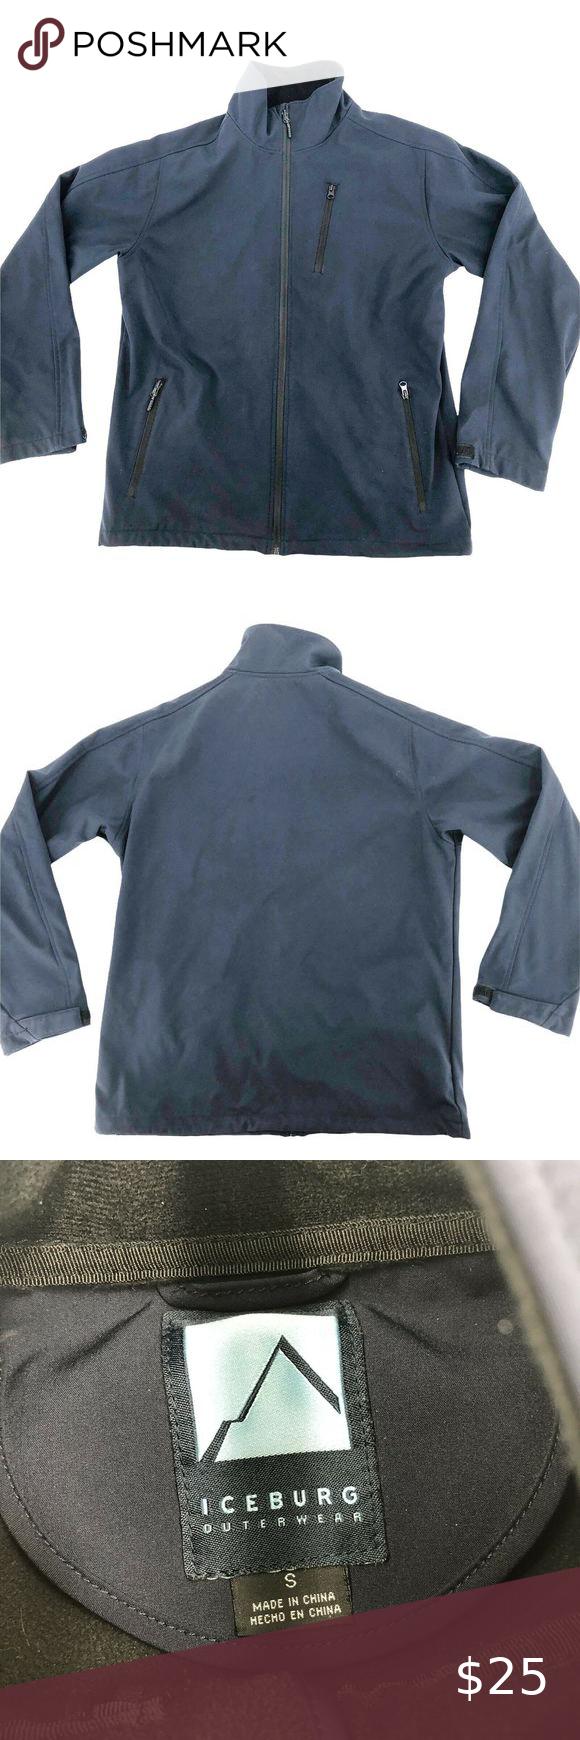 Iceberg Outerwear Men Zip Up Jacket S Outerwear Clothes Design Mens Outerwear [ 1740 x 580 Pixel ]